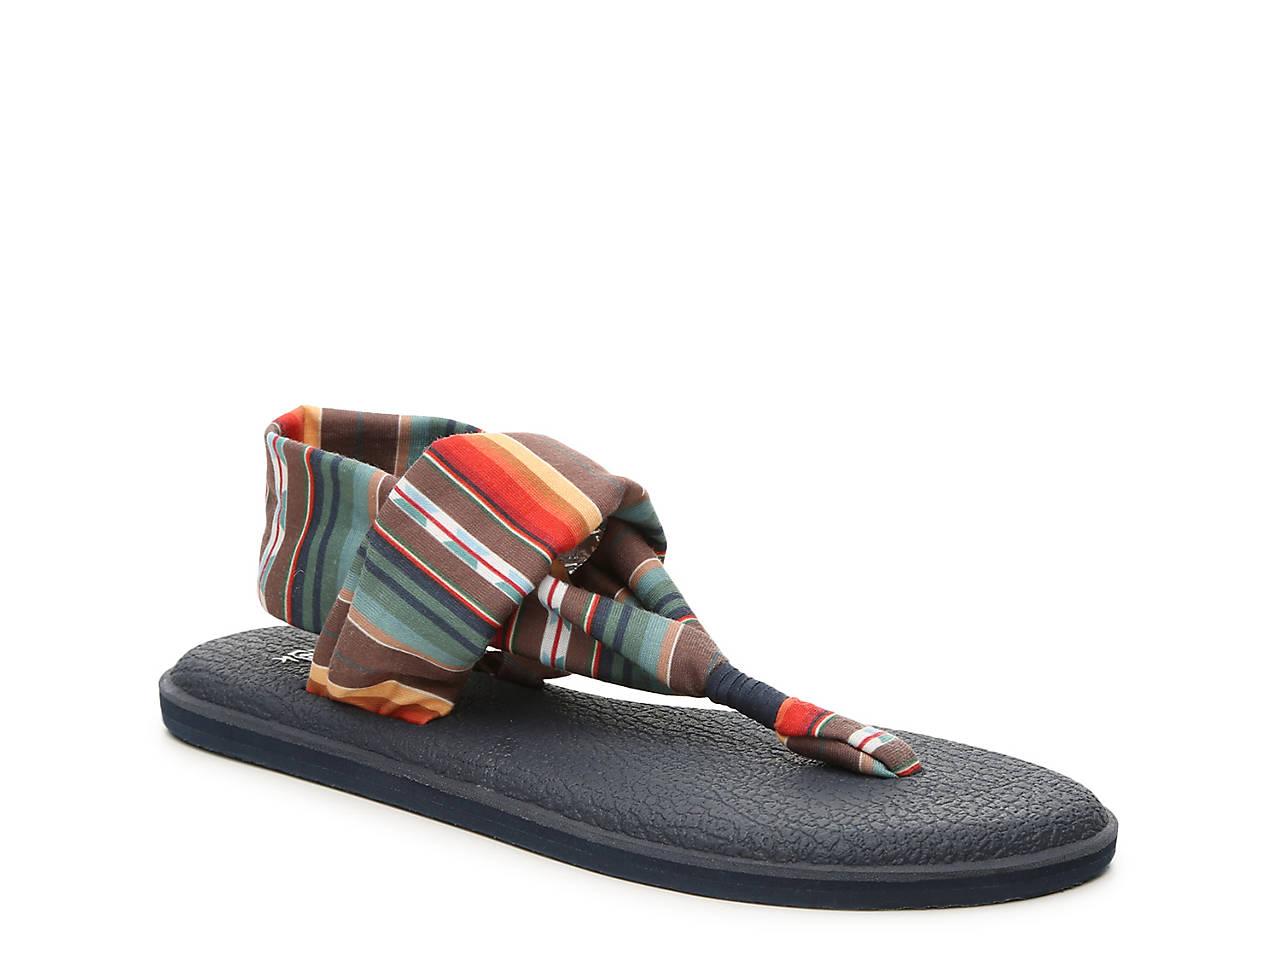 31ea61f076e Sanuk Yoga Sling 2 Sandal Women s Shoes